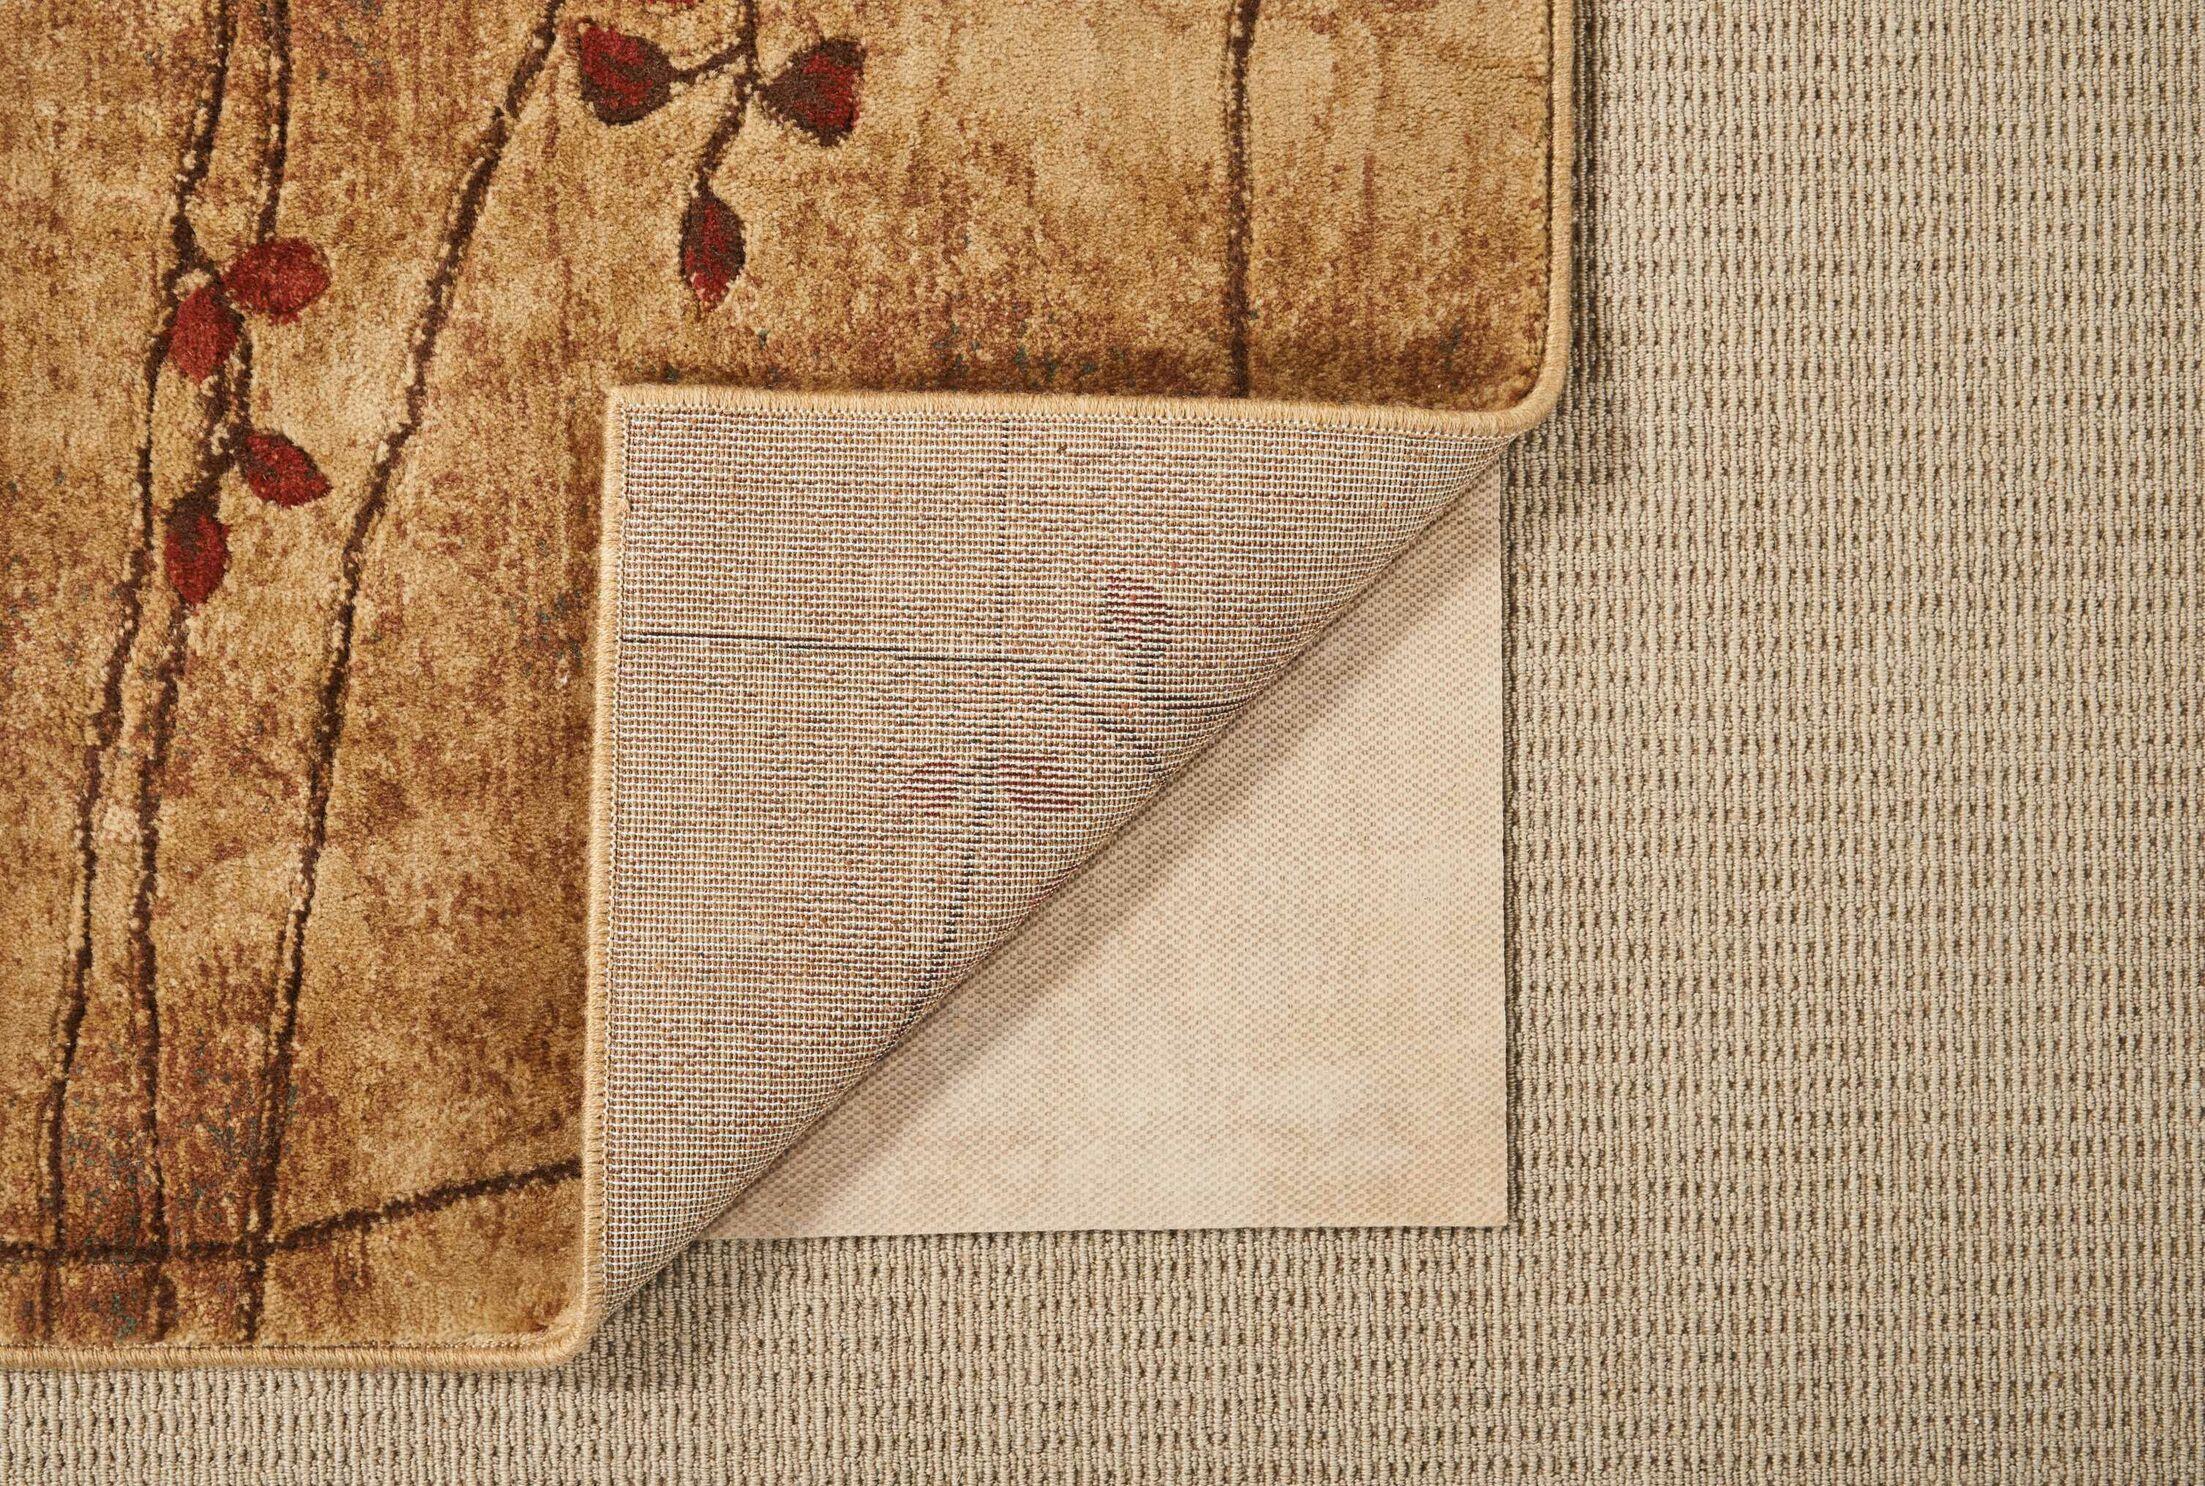 Tan Rug Pad Rug Pad Size: Rectangle 8' x 10'